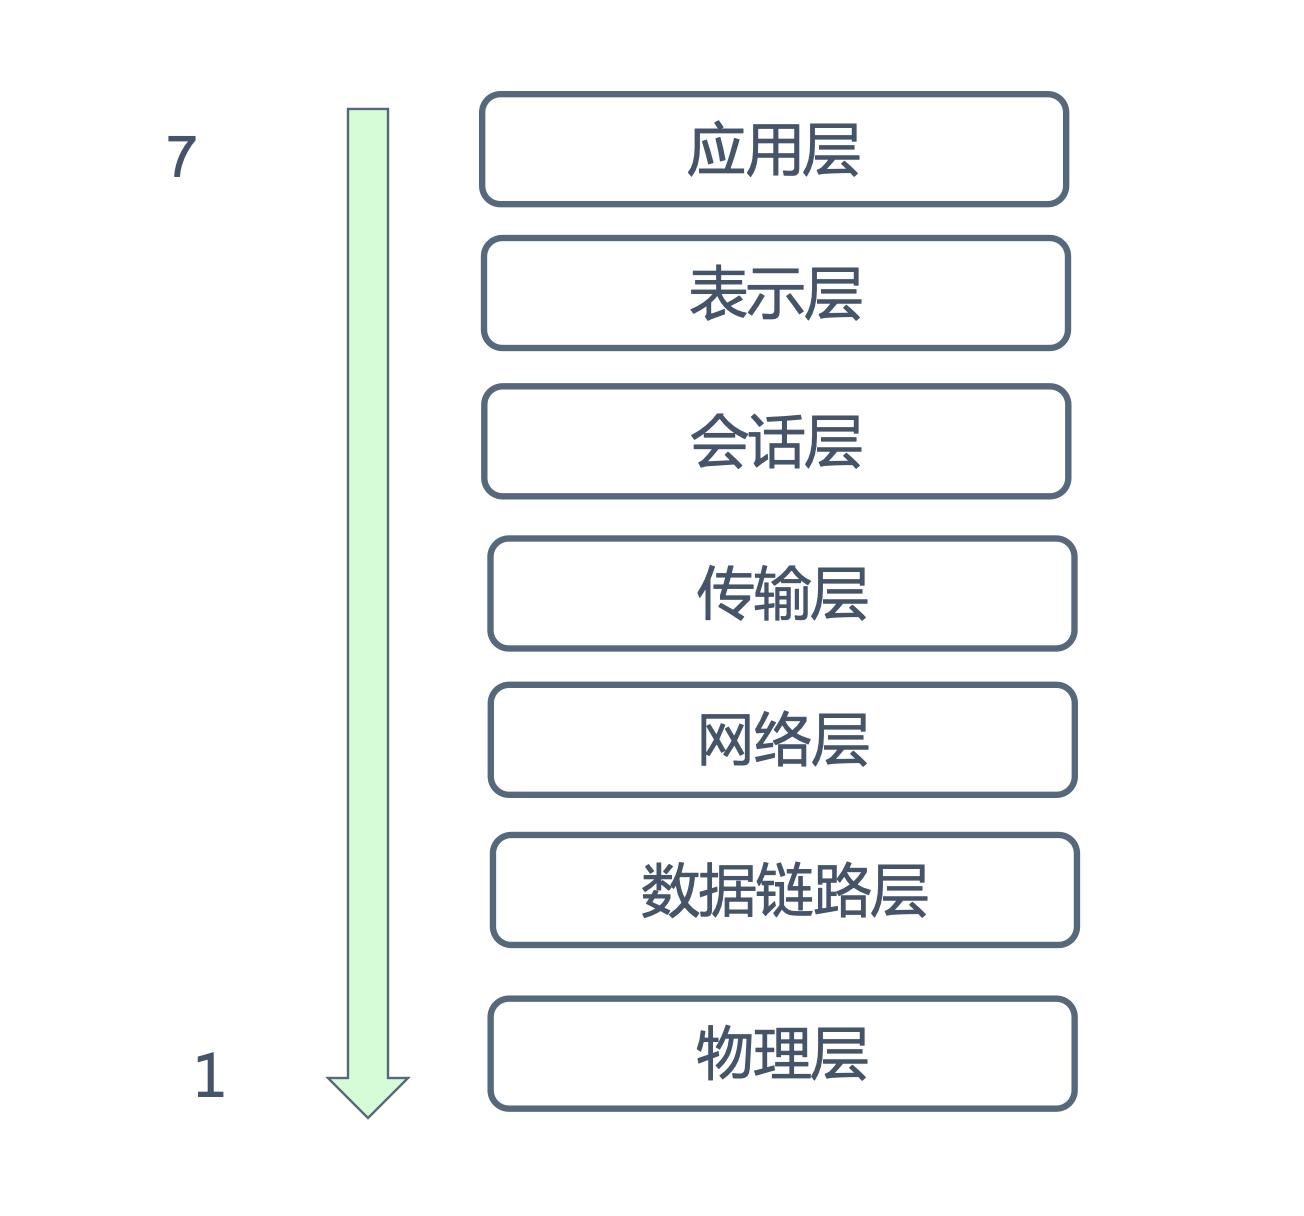 osi七层模型简图.png